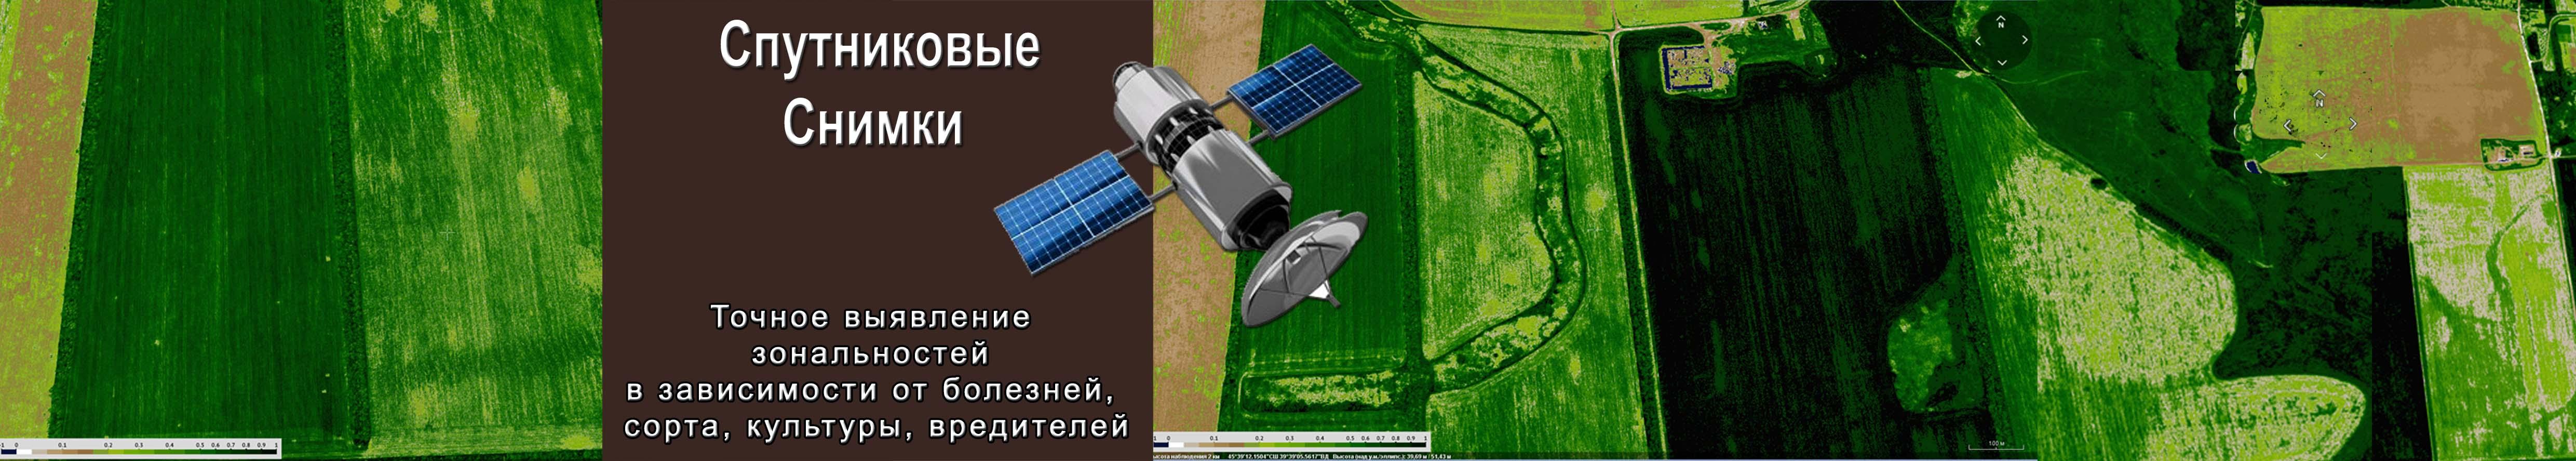 Космоснимки-коллаж-22